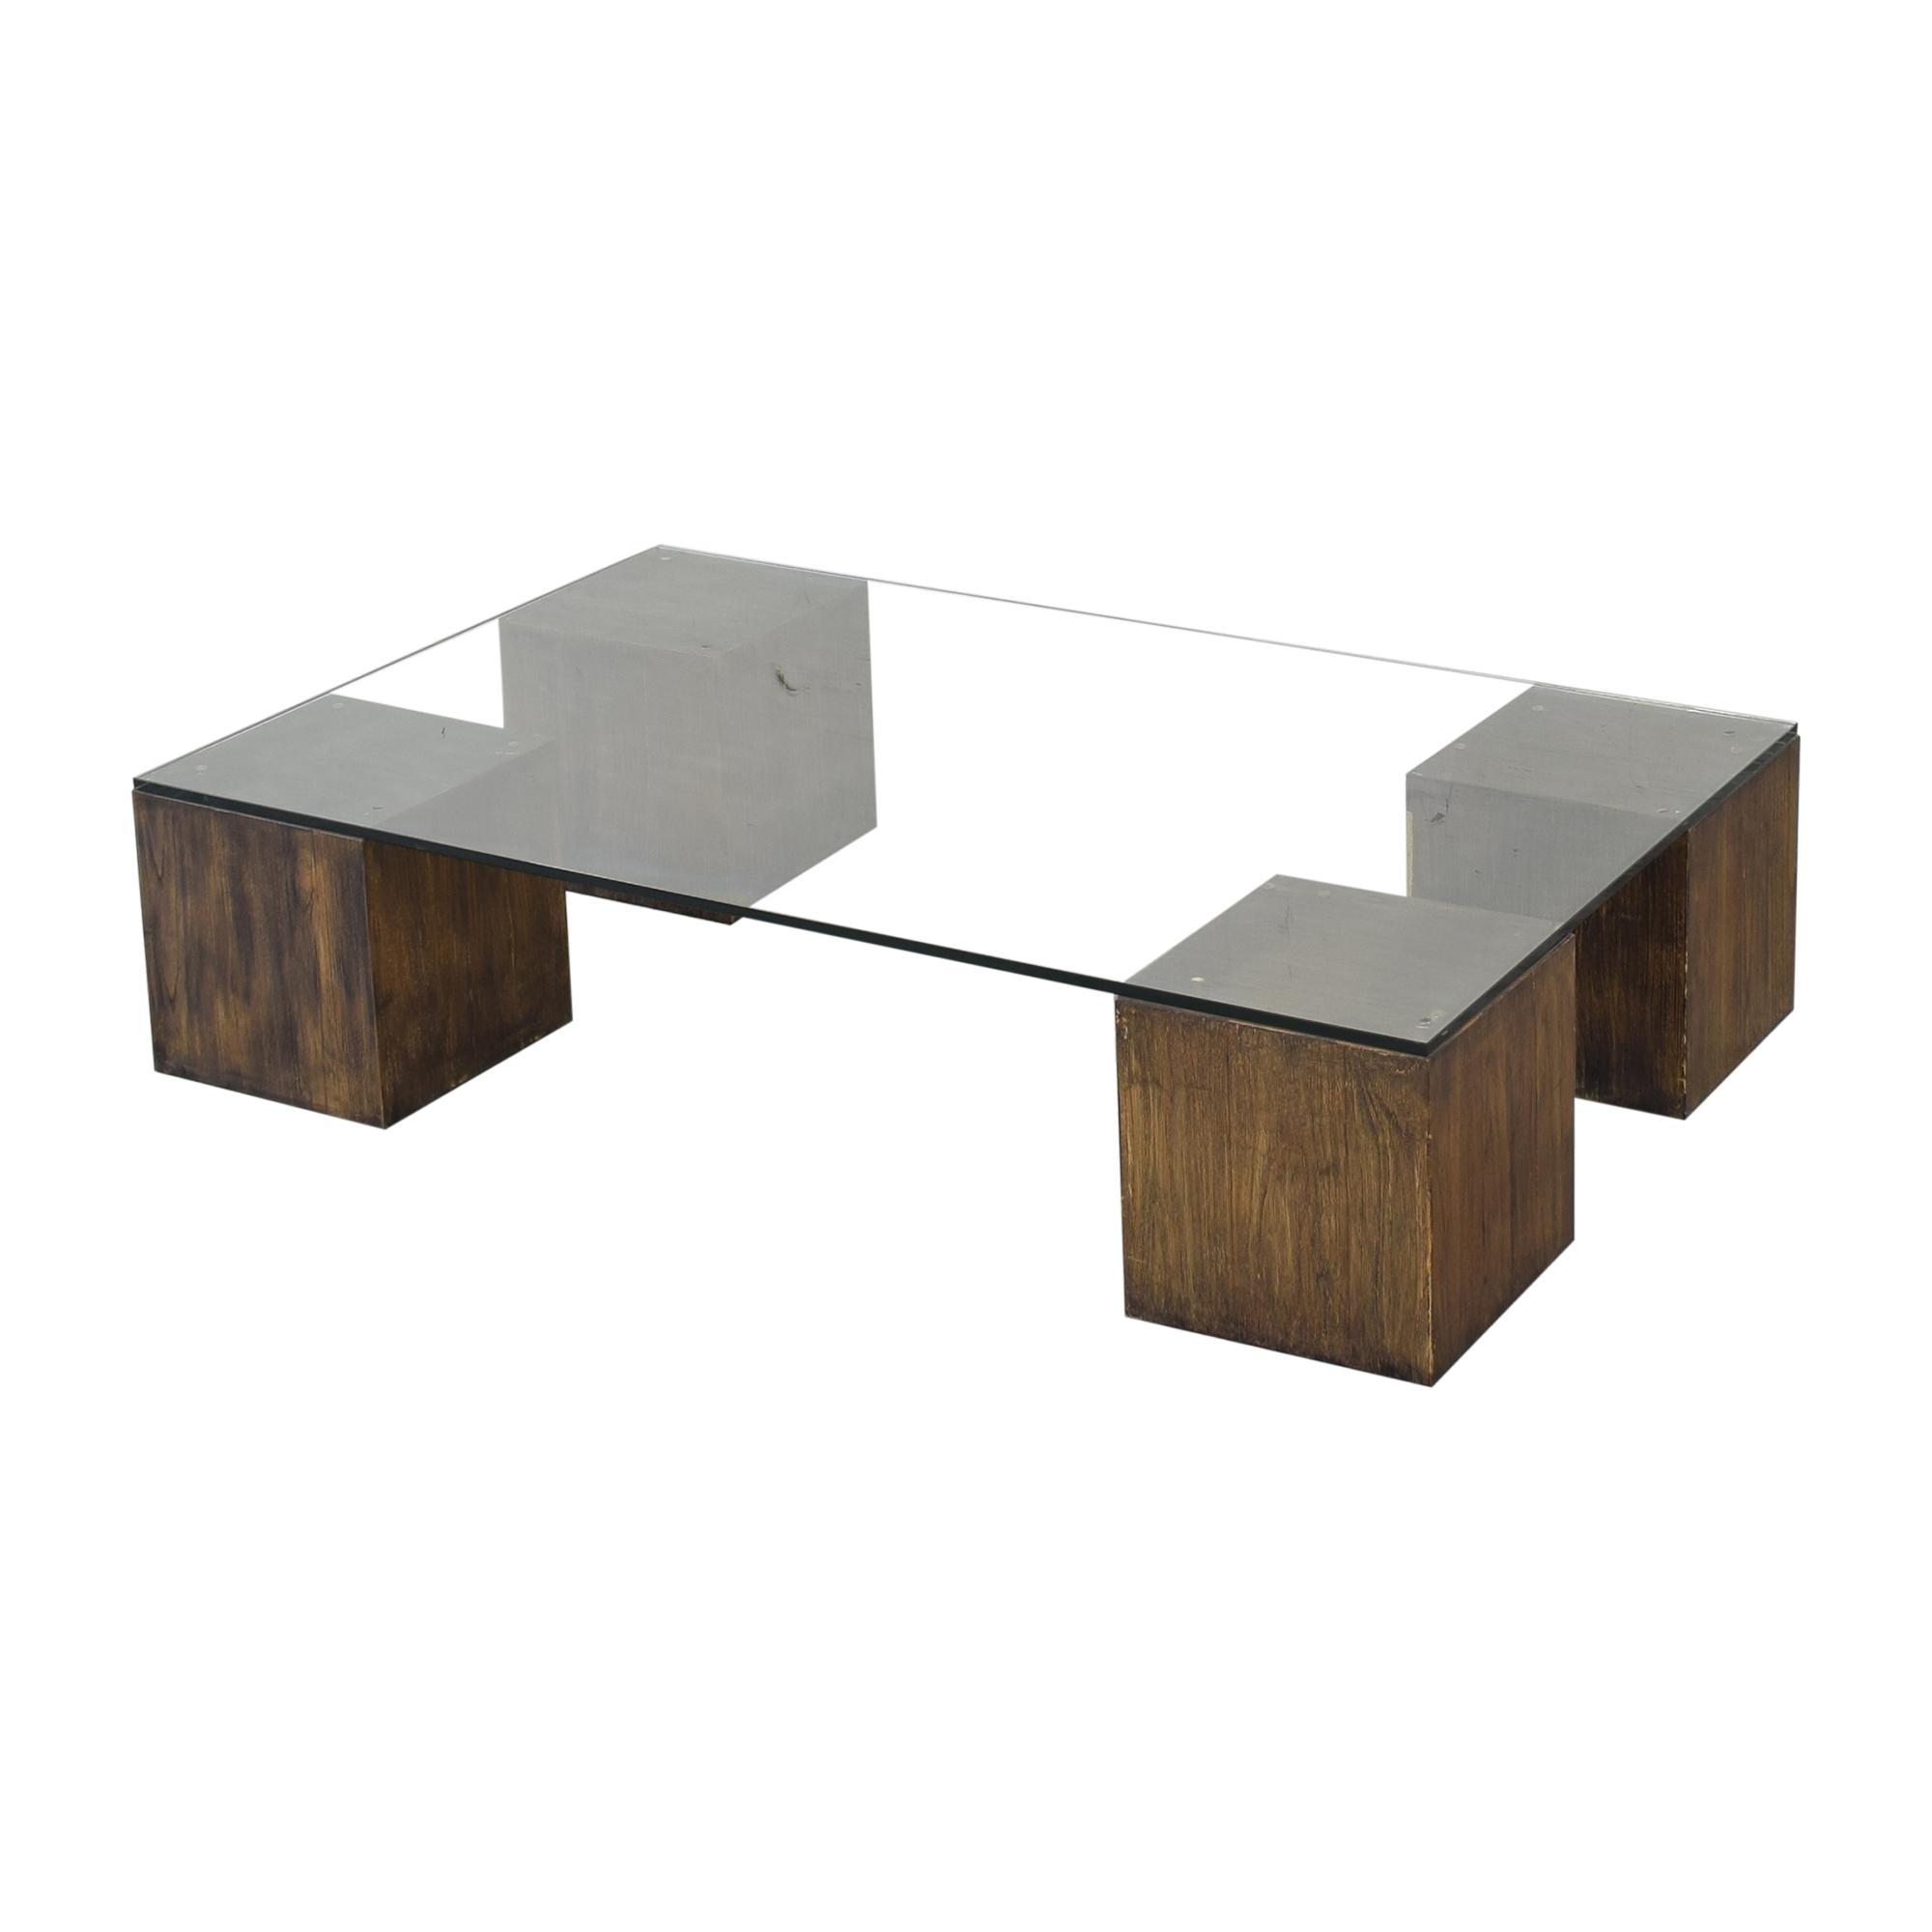 shop West Elm West Elm Raw Cube Coffee Table online